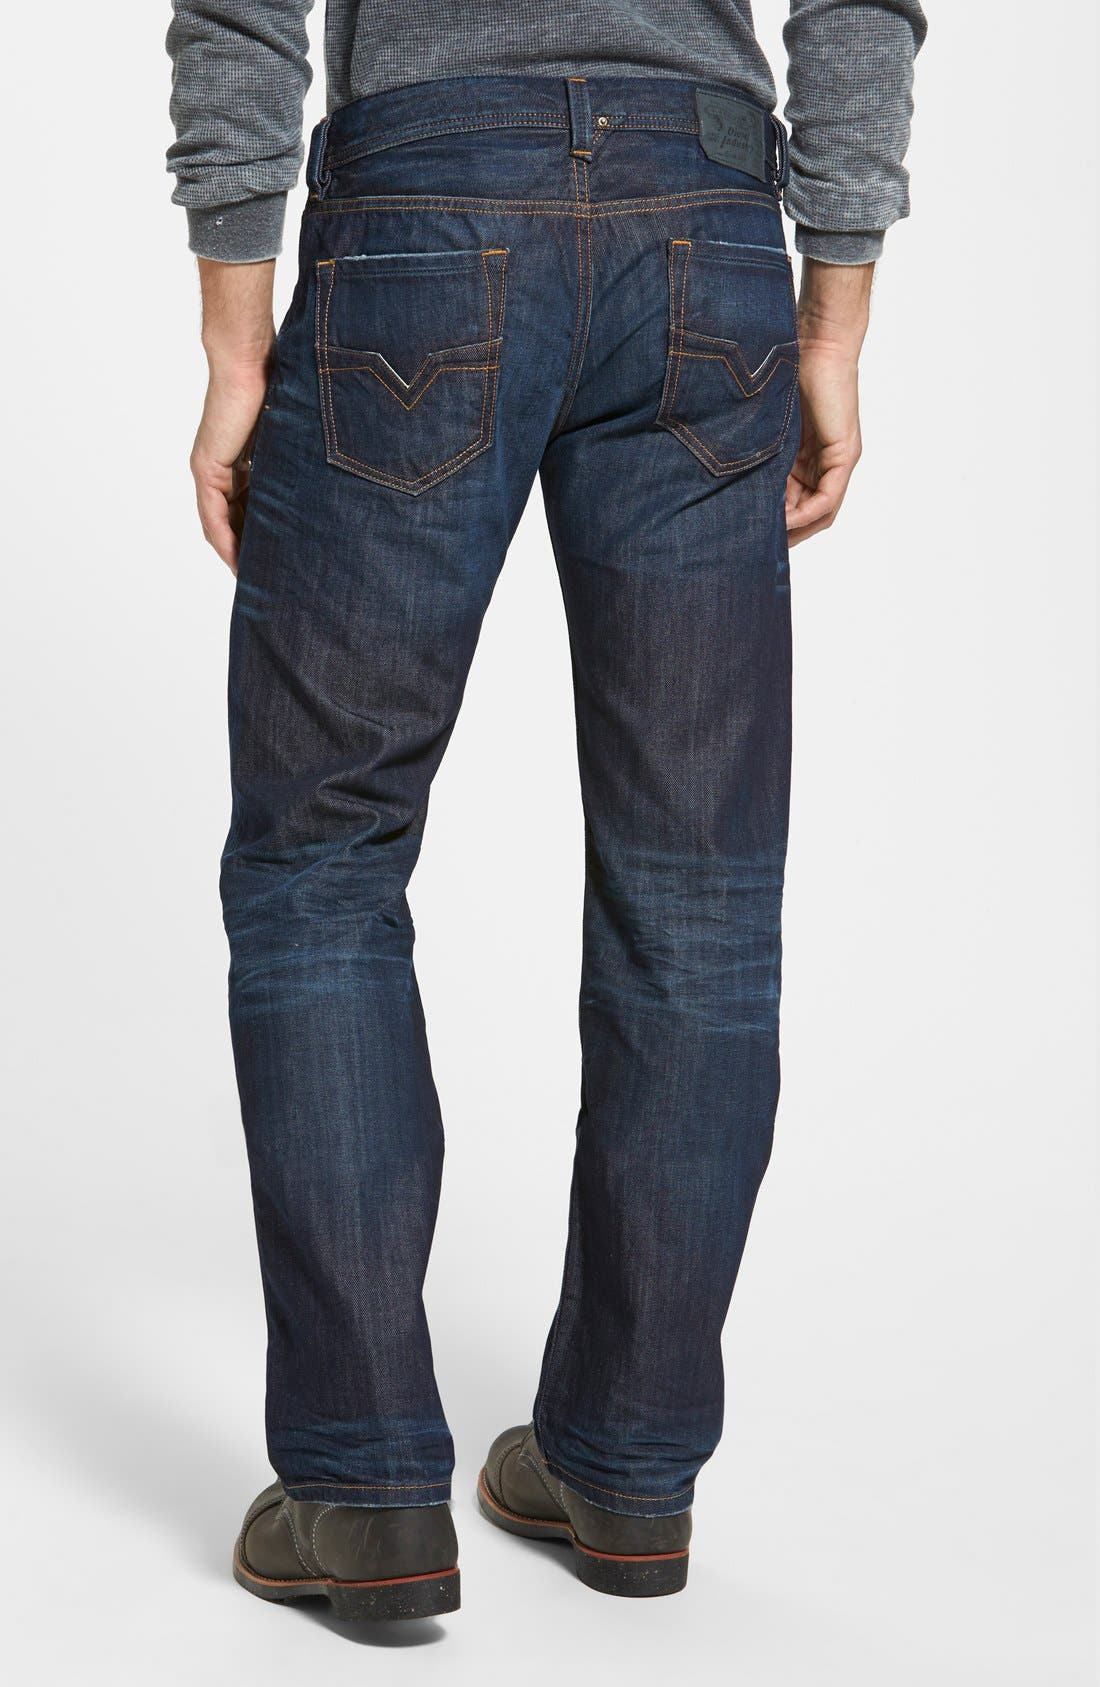 Larkee Straight Leg Jeans,                             Alternate thumbnail 2, color,                             0806W